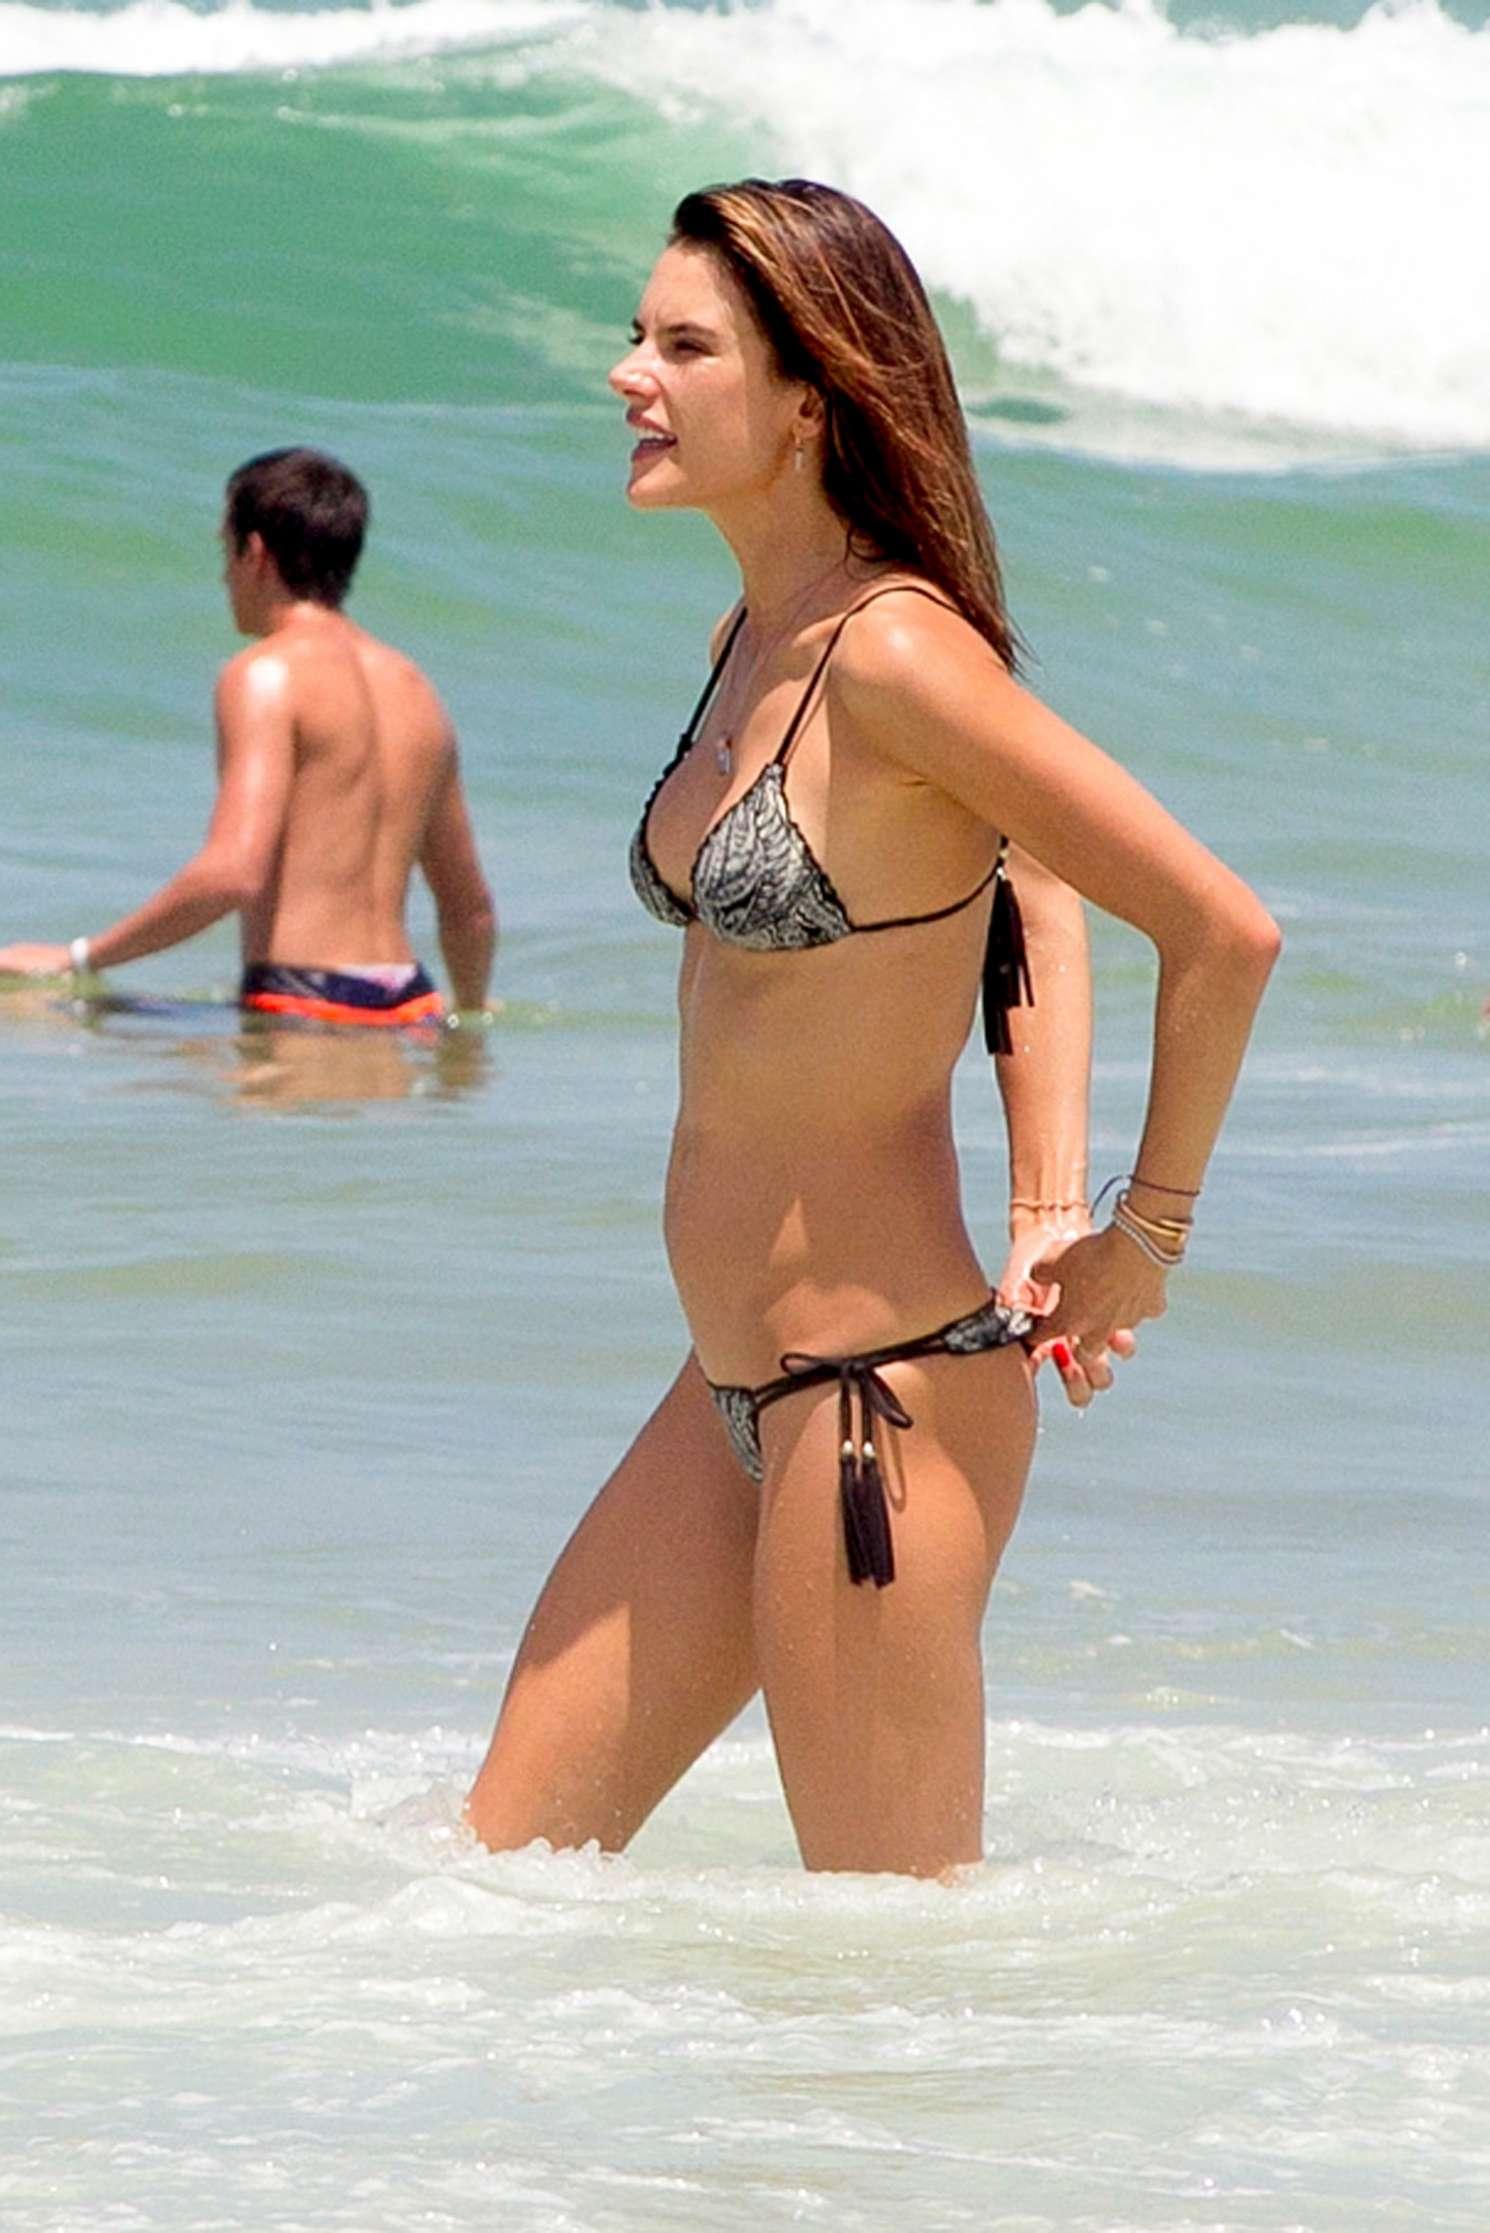 Watch Alessandra Ambrosio in a Bikini - 27 Photos video